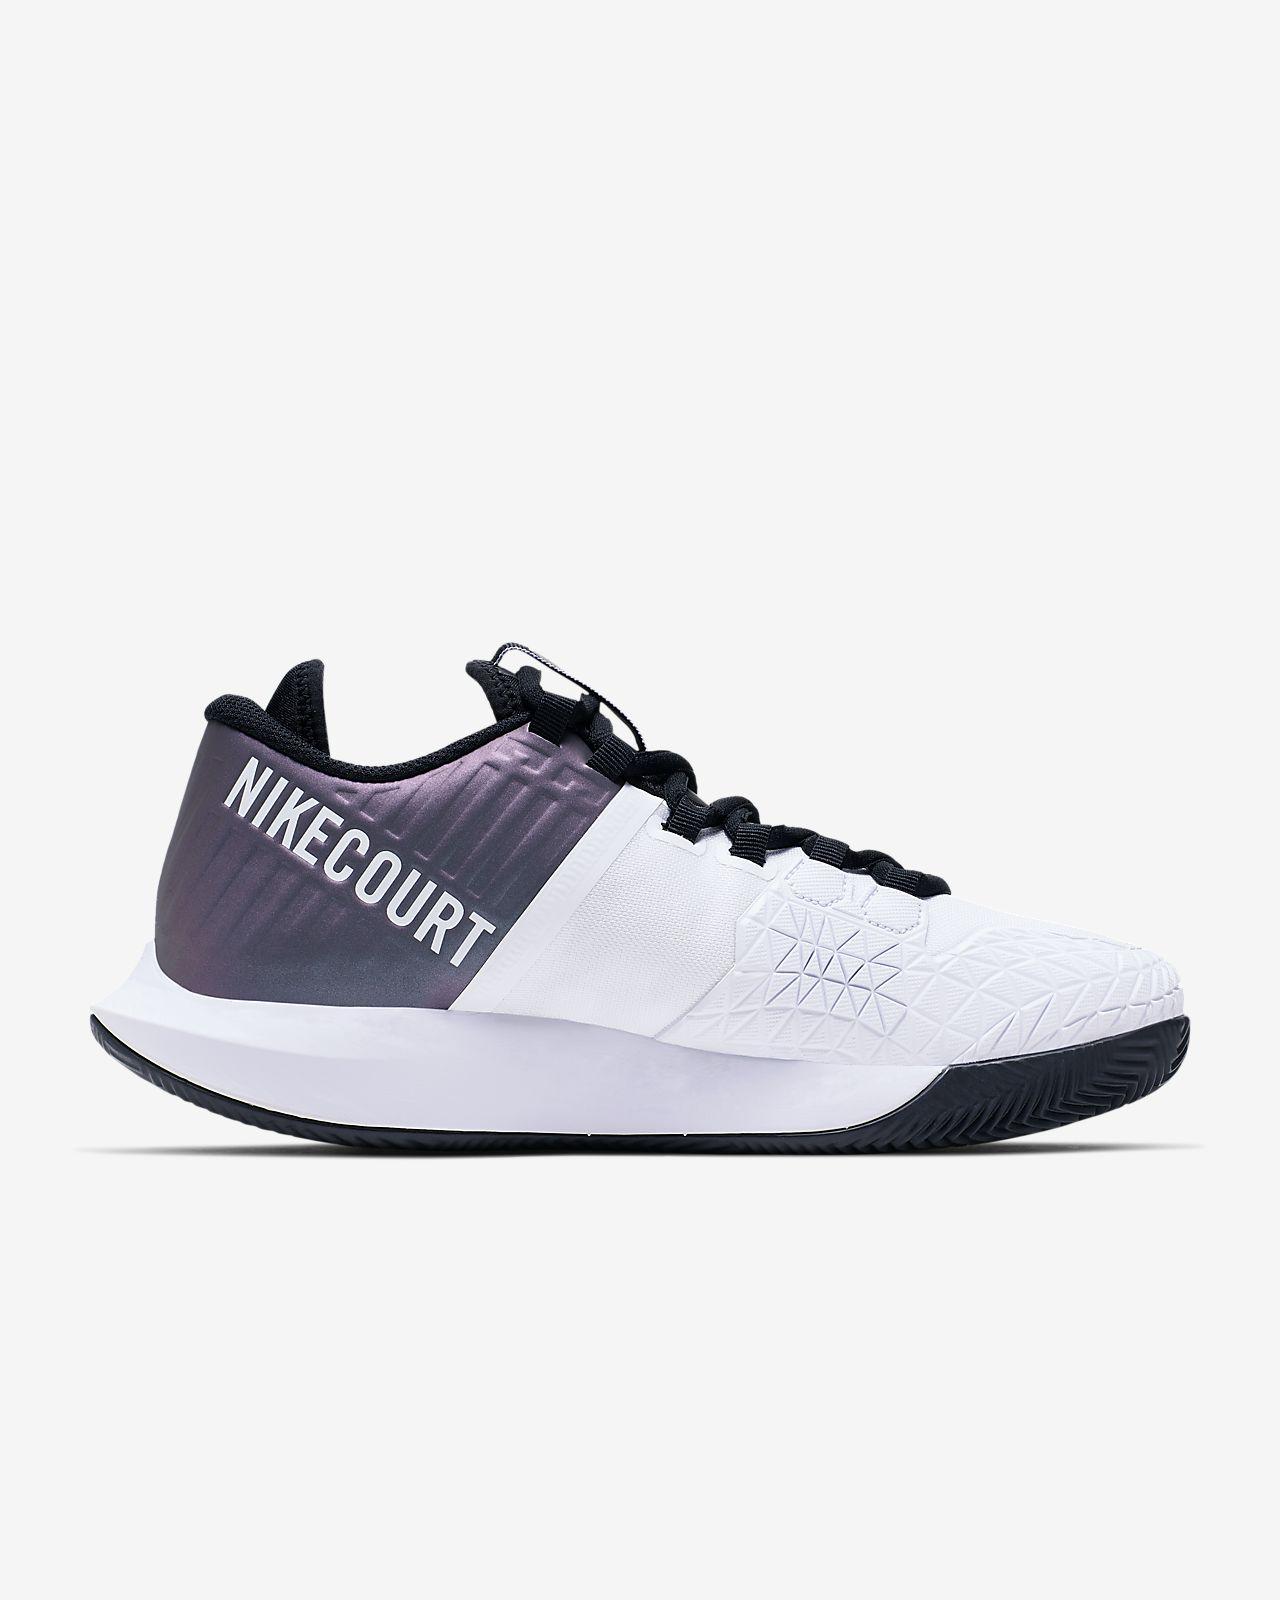 Femme De Chaussure Nikecourt Zoom Air Battue Terre Zero Tennis Pour XnPk8w0O